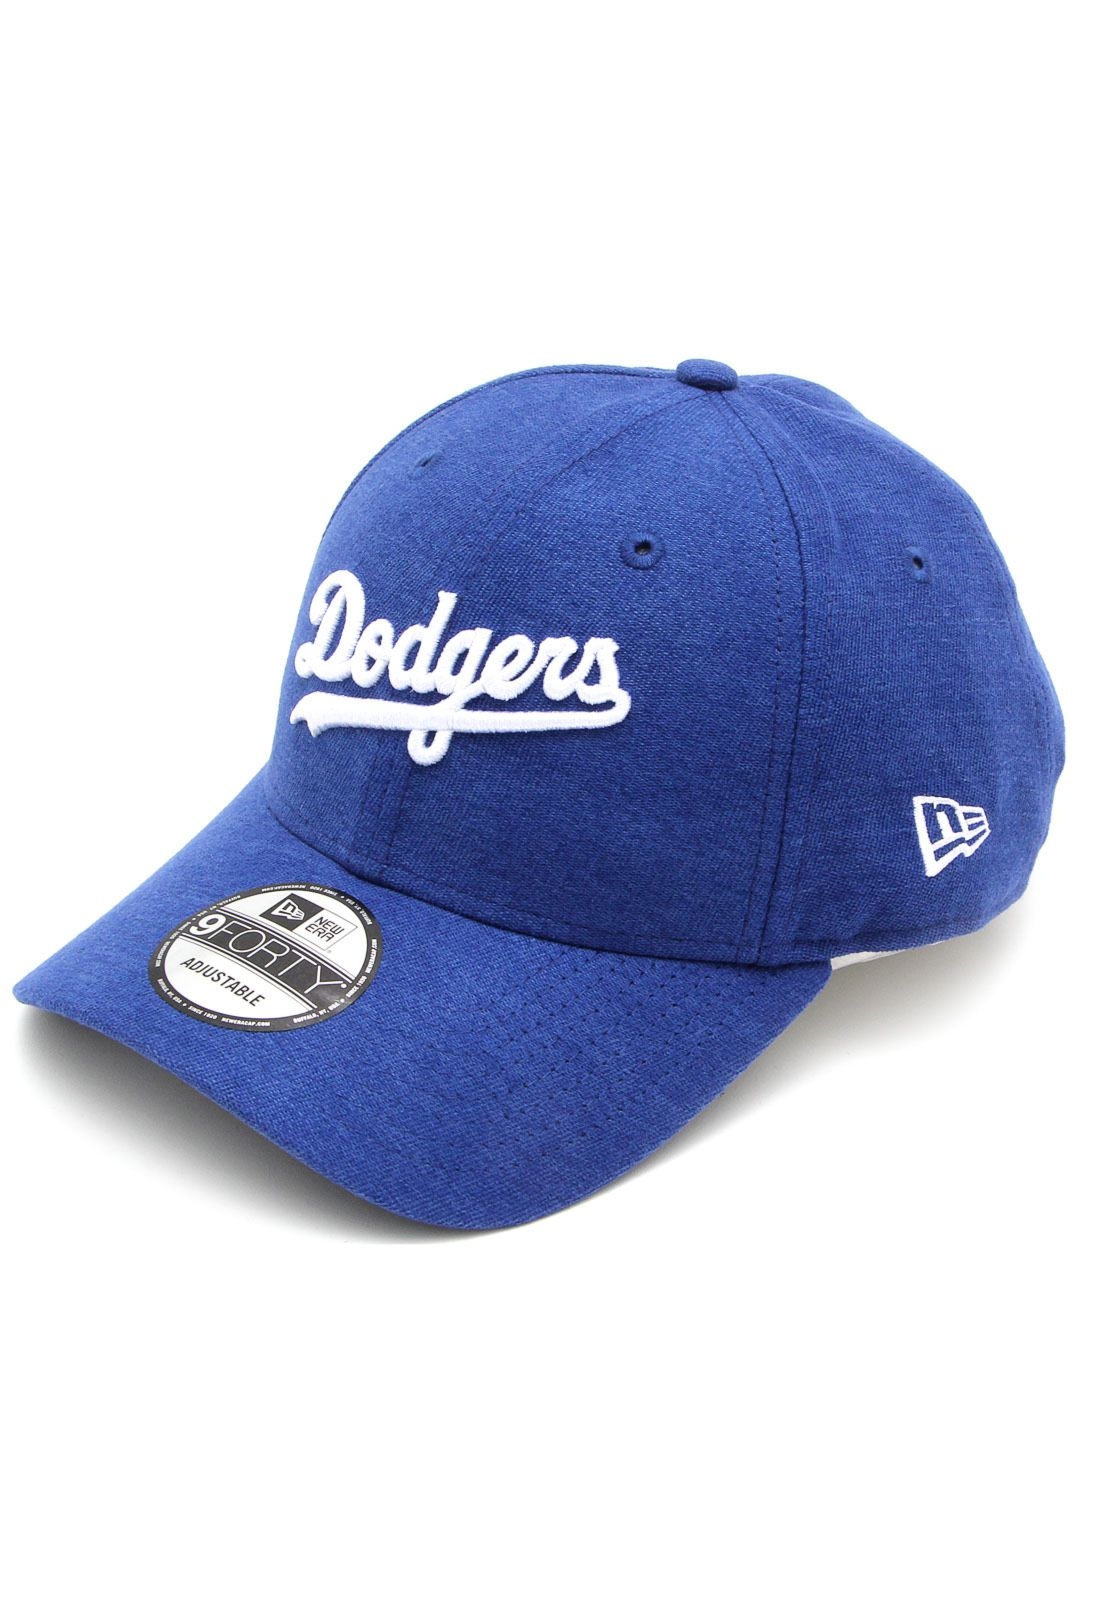 87951b27d64f62 Boné New Era Los Angeles Dodgers Mlb Azul in 2019 | Los Angeles ...